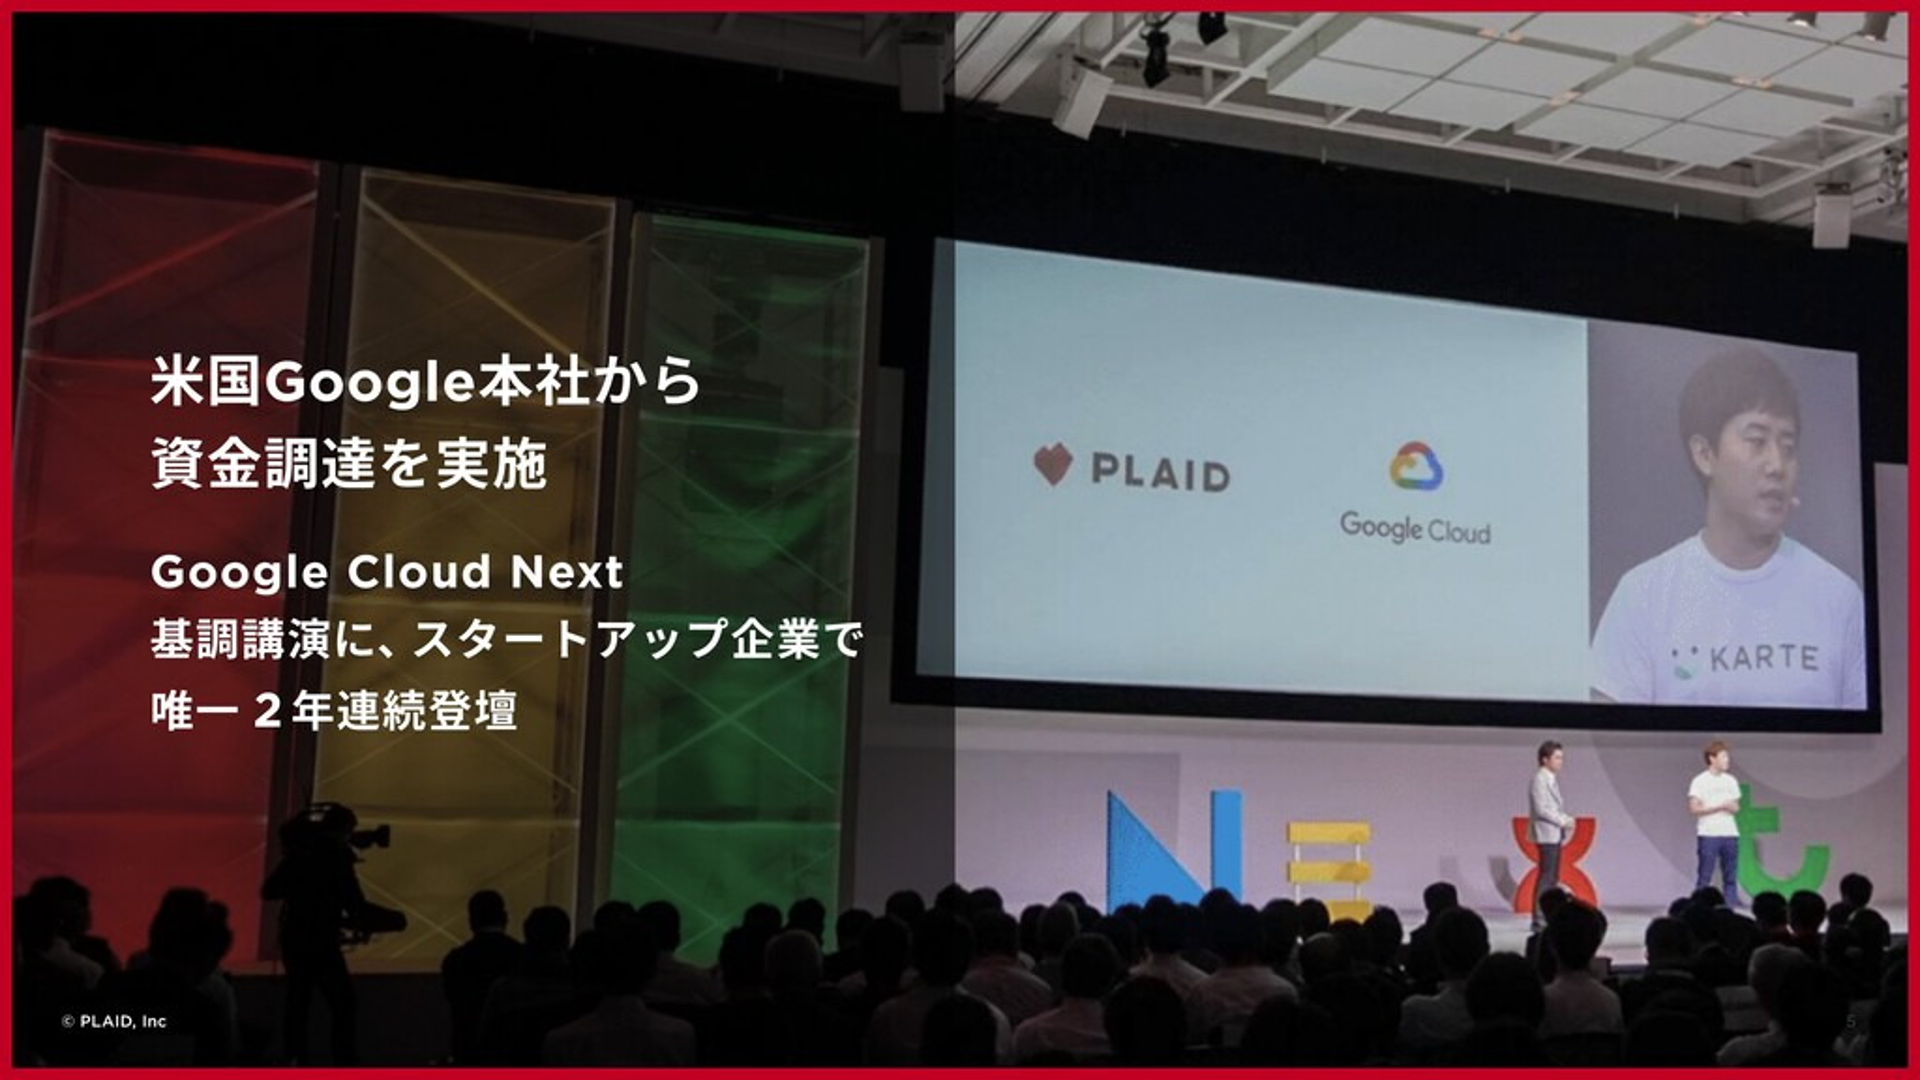 5 © PLAID, Inc ⽶国Google本社から 資⾦調達を実施 Google Clou...